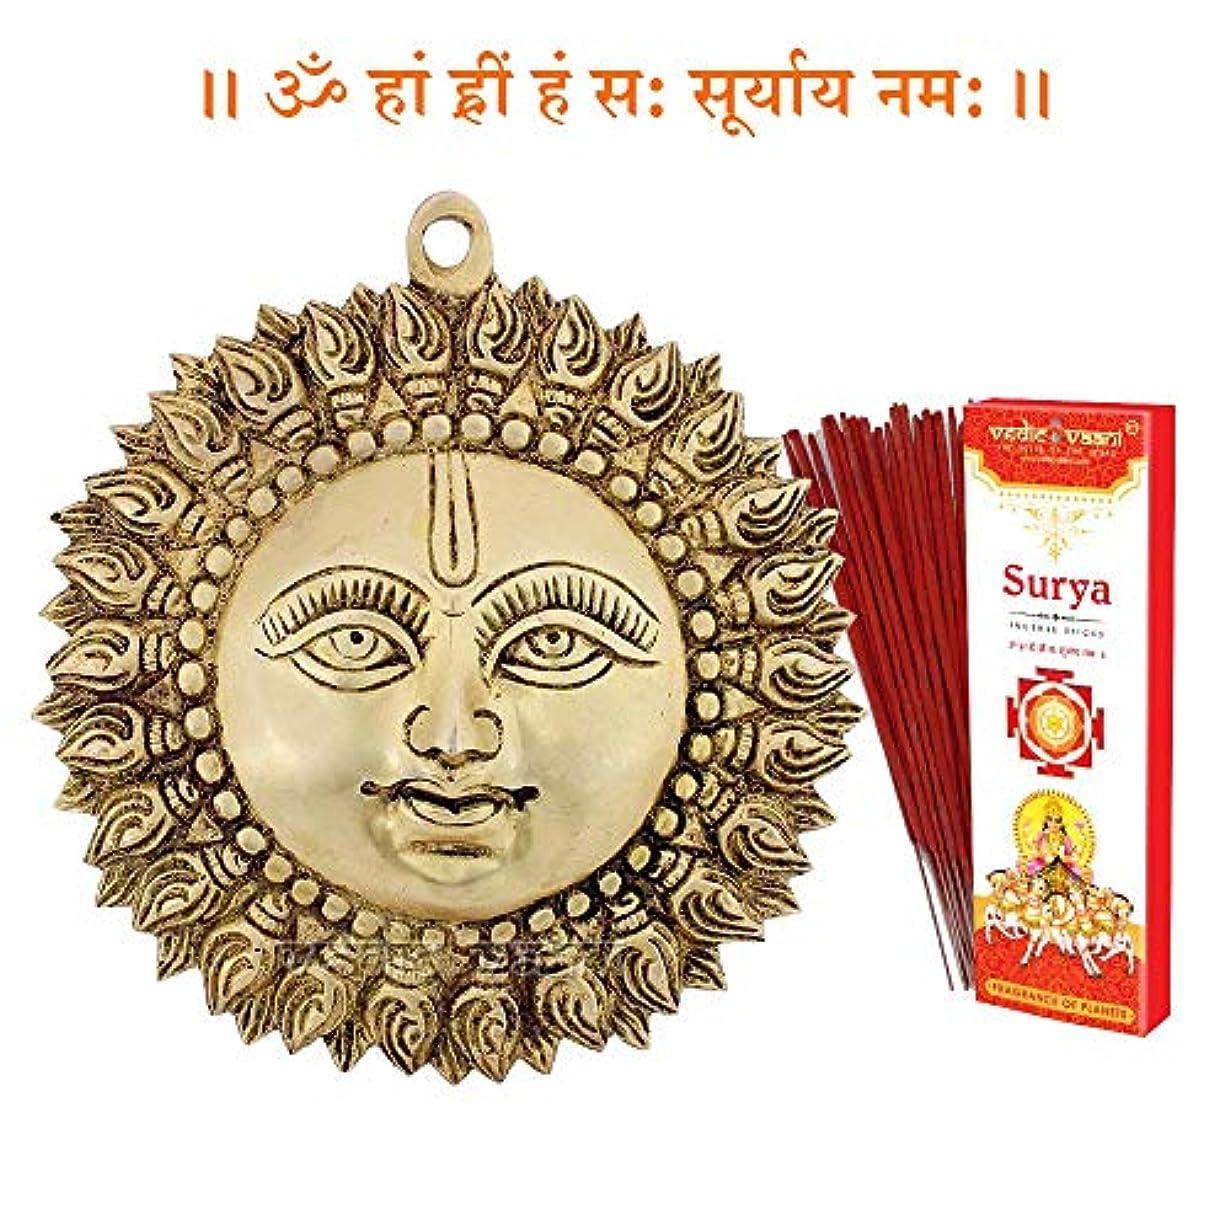 Vedic Vaani Lord Surya Dev (Sun) 壁掛け Surya お香スティック付き